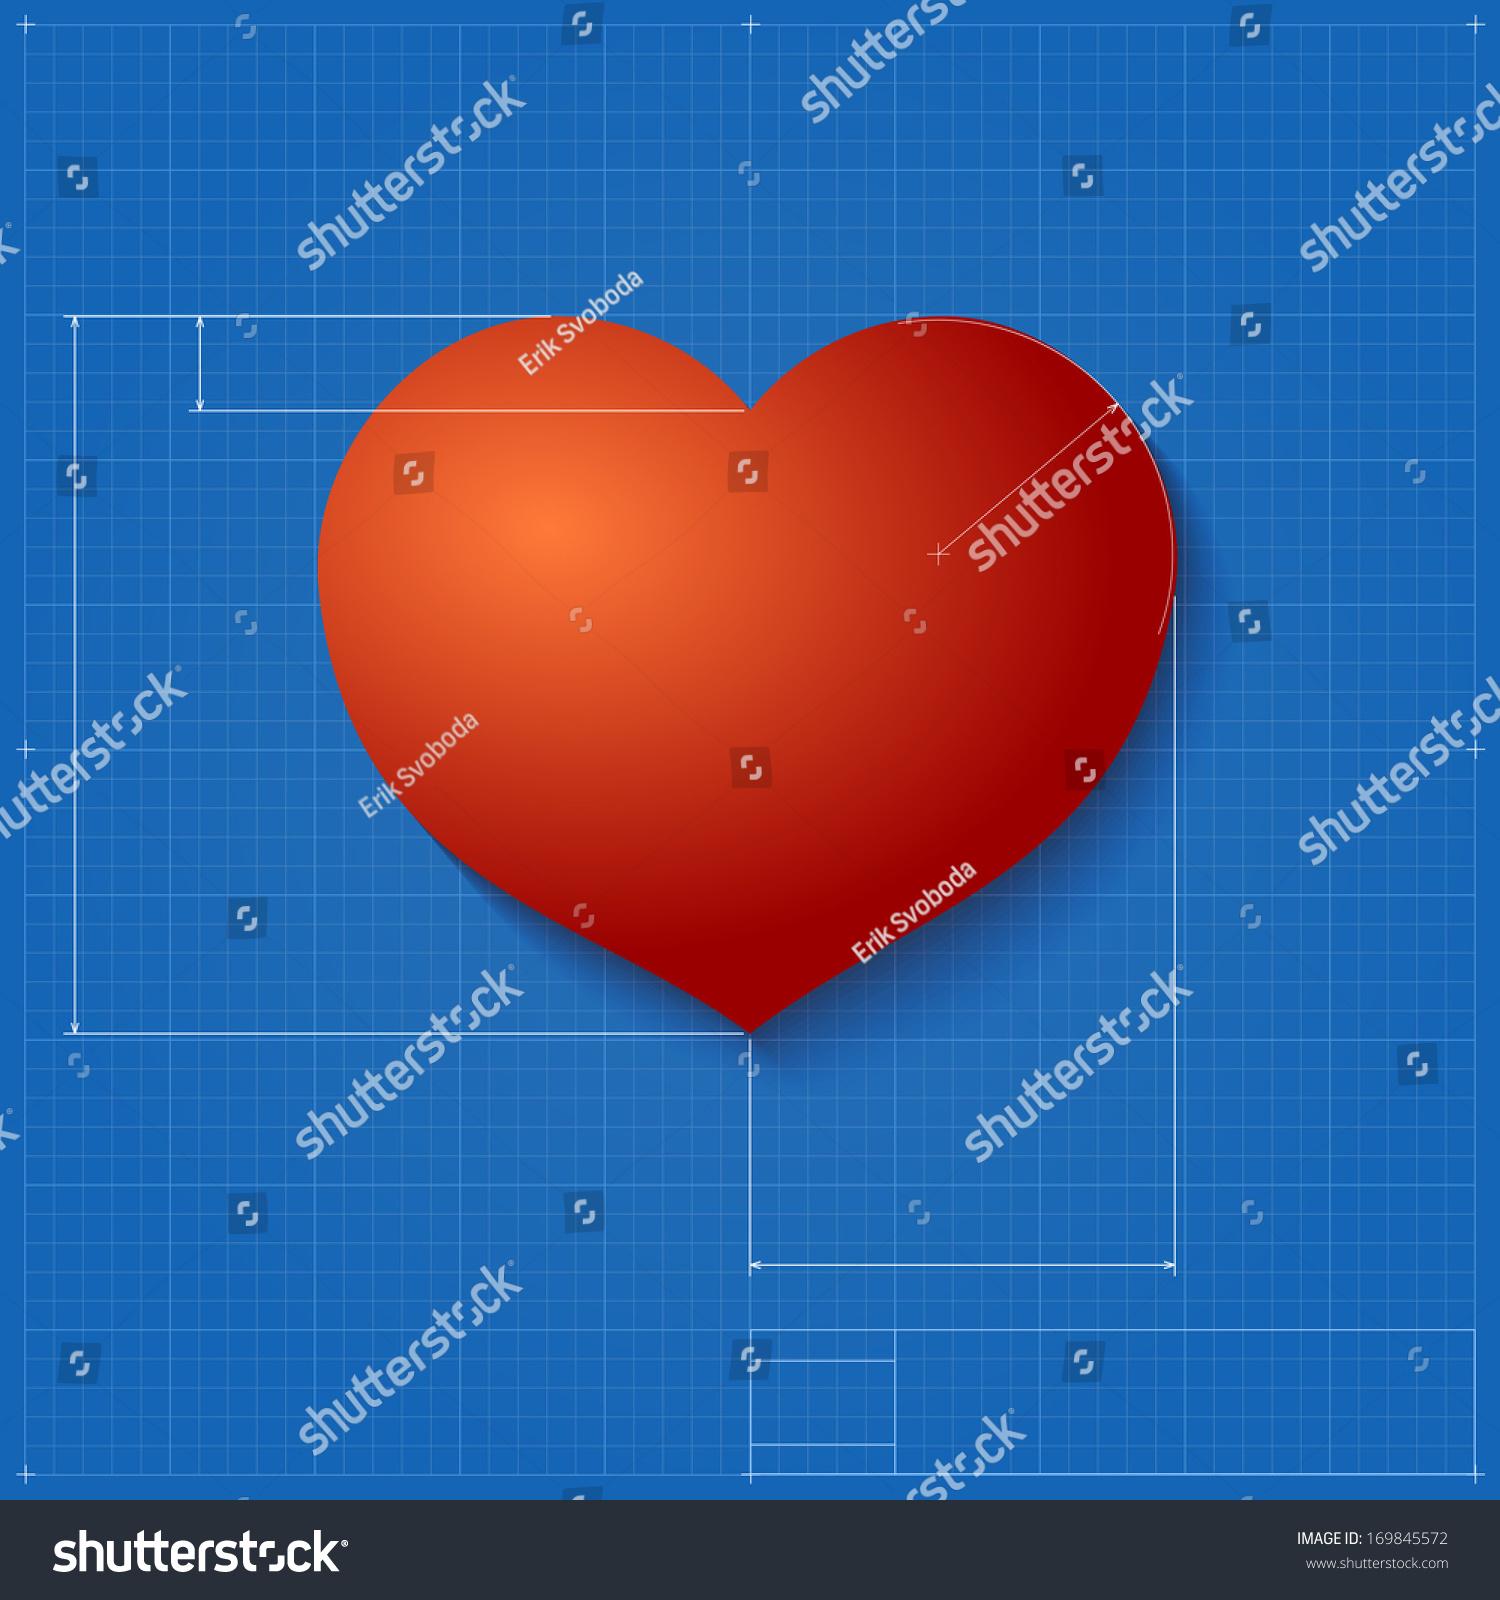 Heart symbol like blueprint drawing stylized stock illustration heart symbol like blueprint drawing stylized stock illustration 169845572 shutterstock malvernweather Gallery